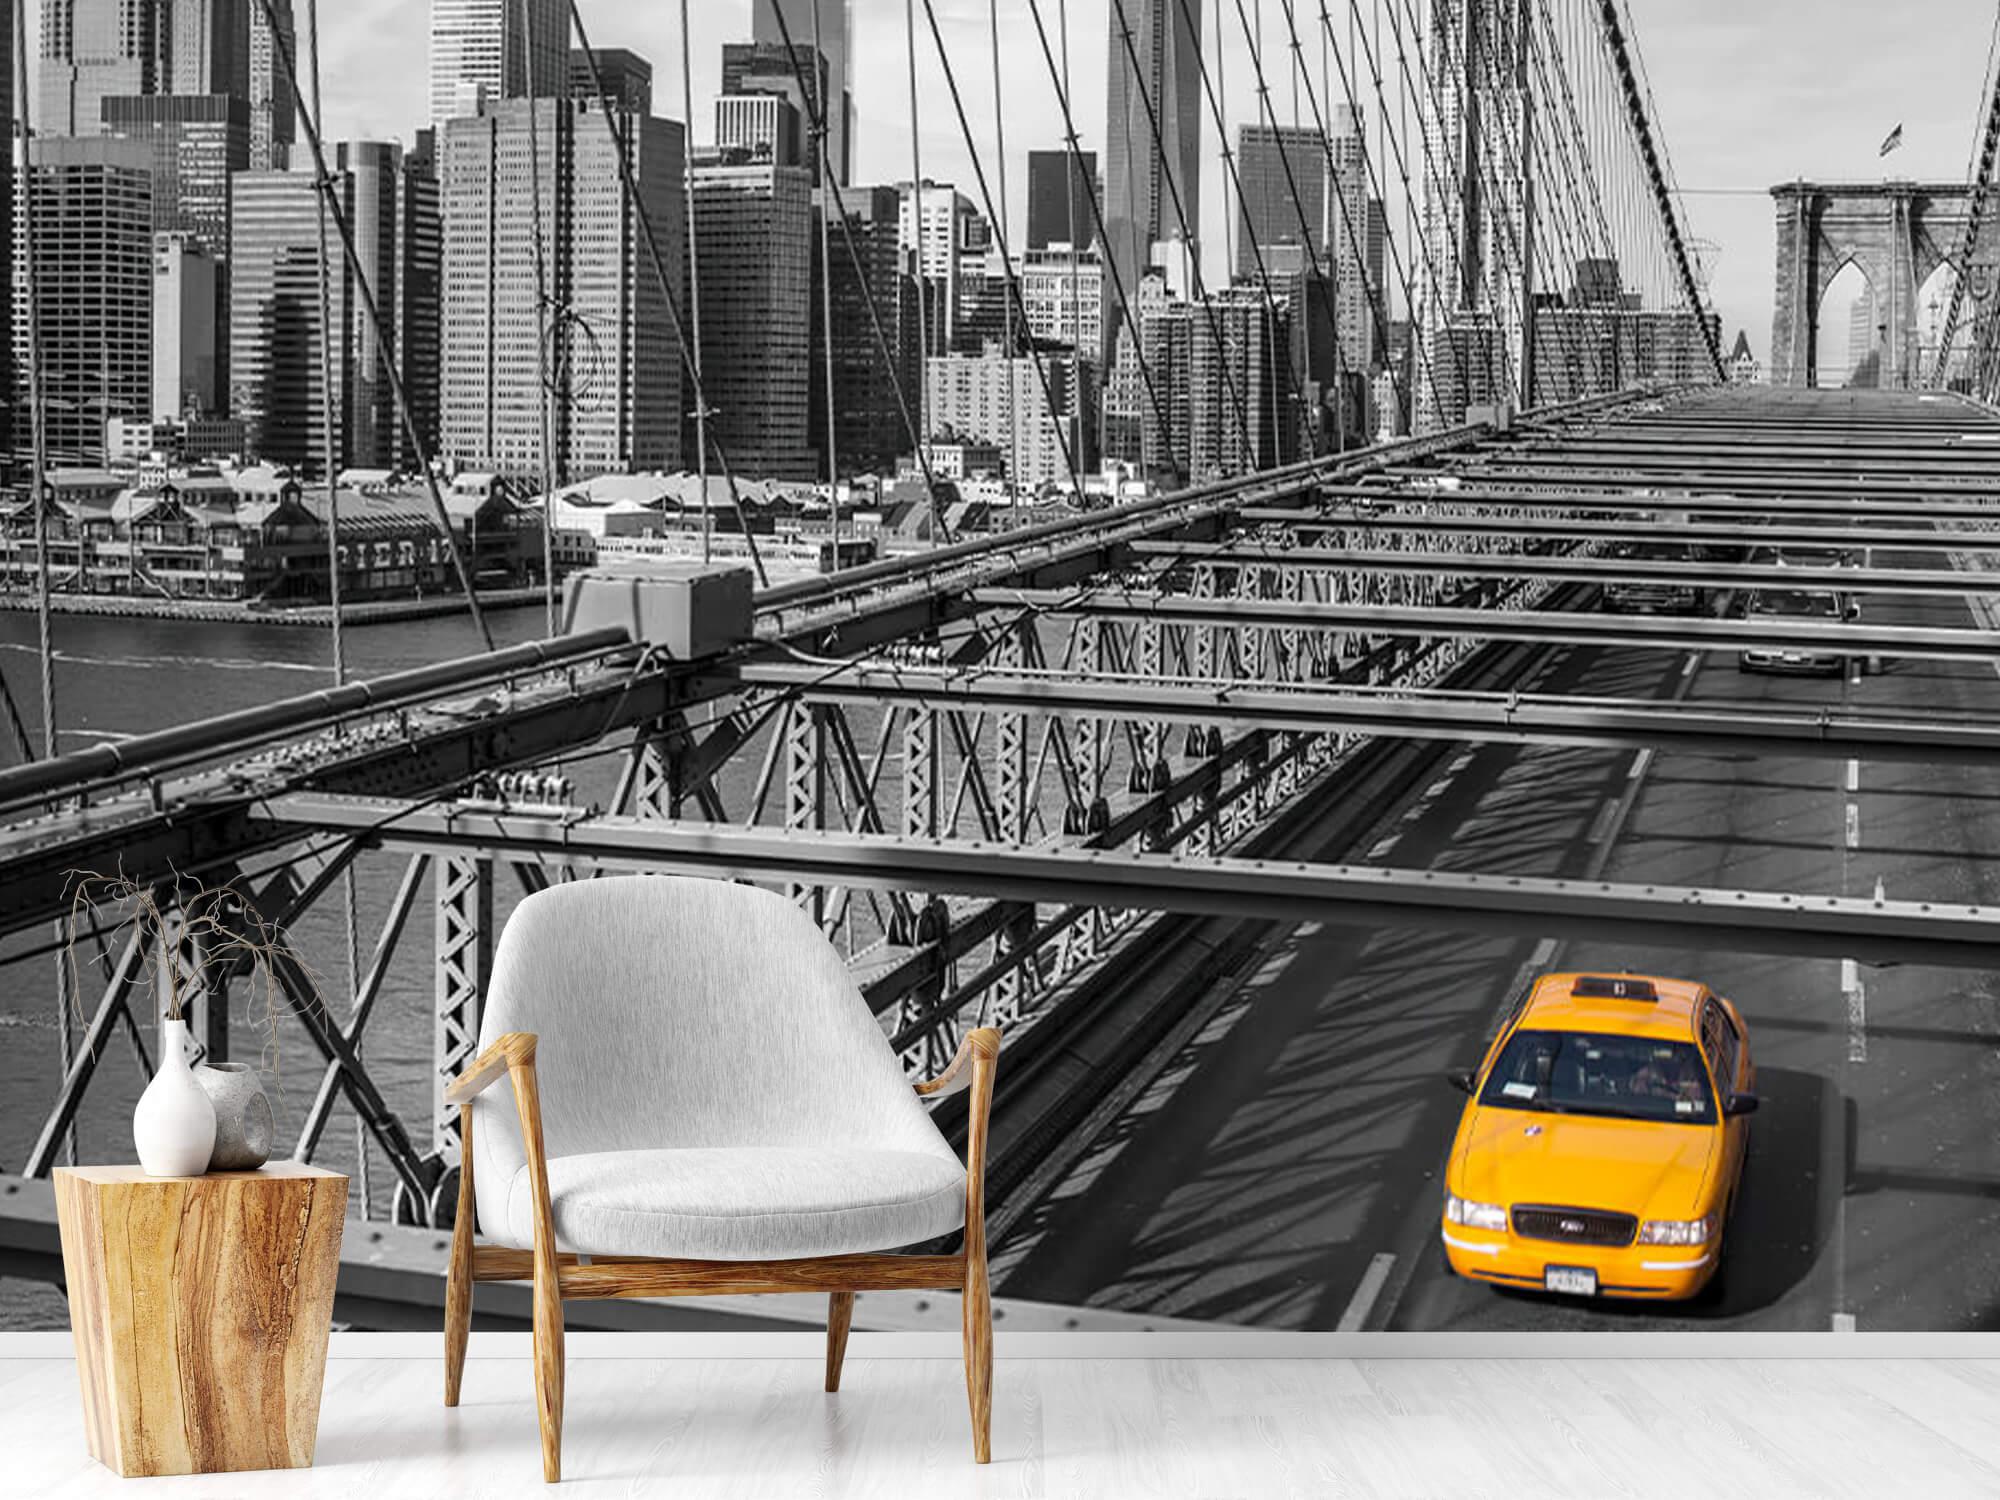 A taxi across the Brooklyn Bridge 2